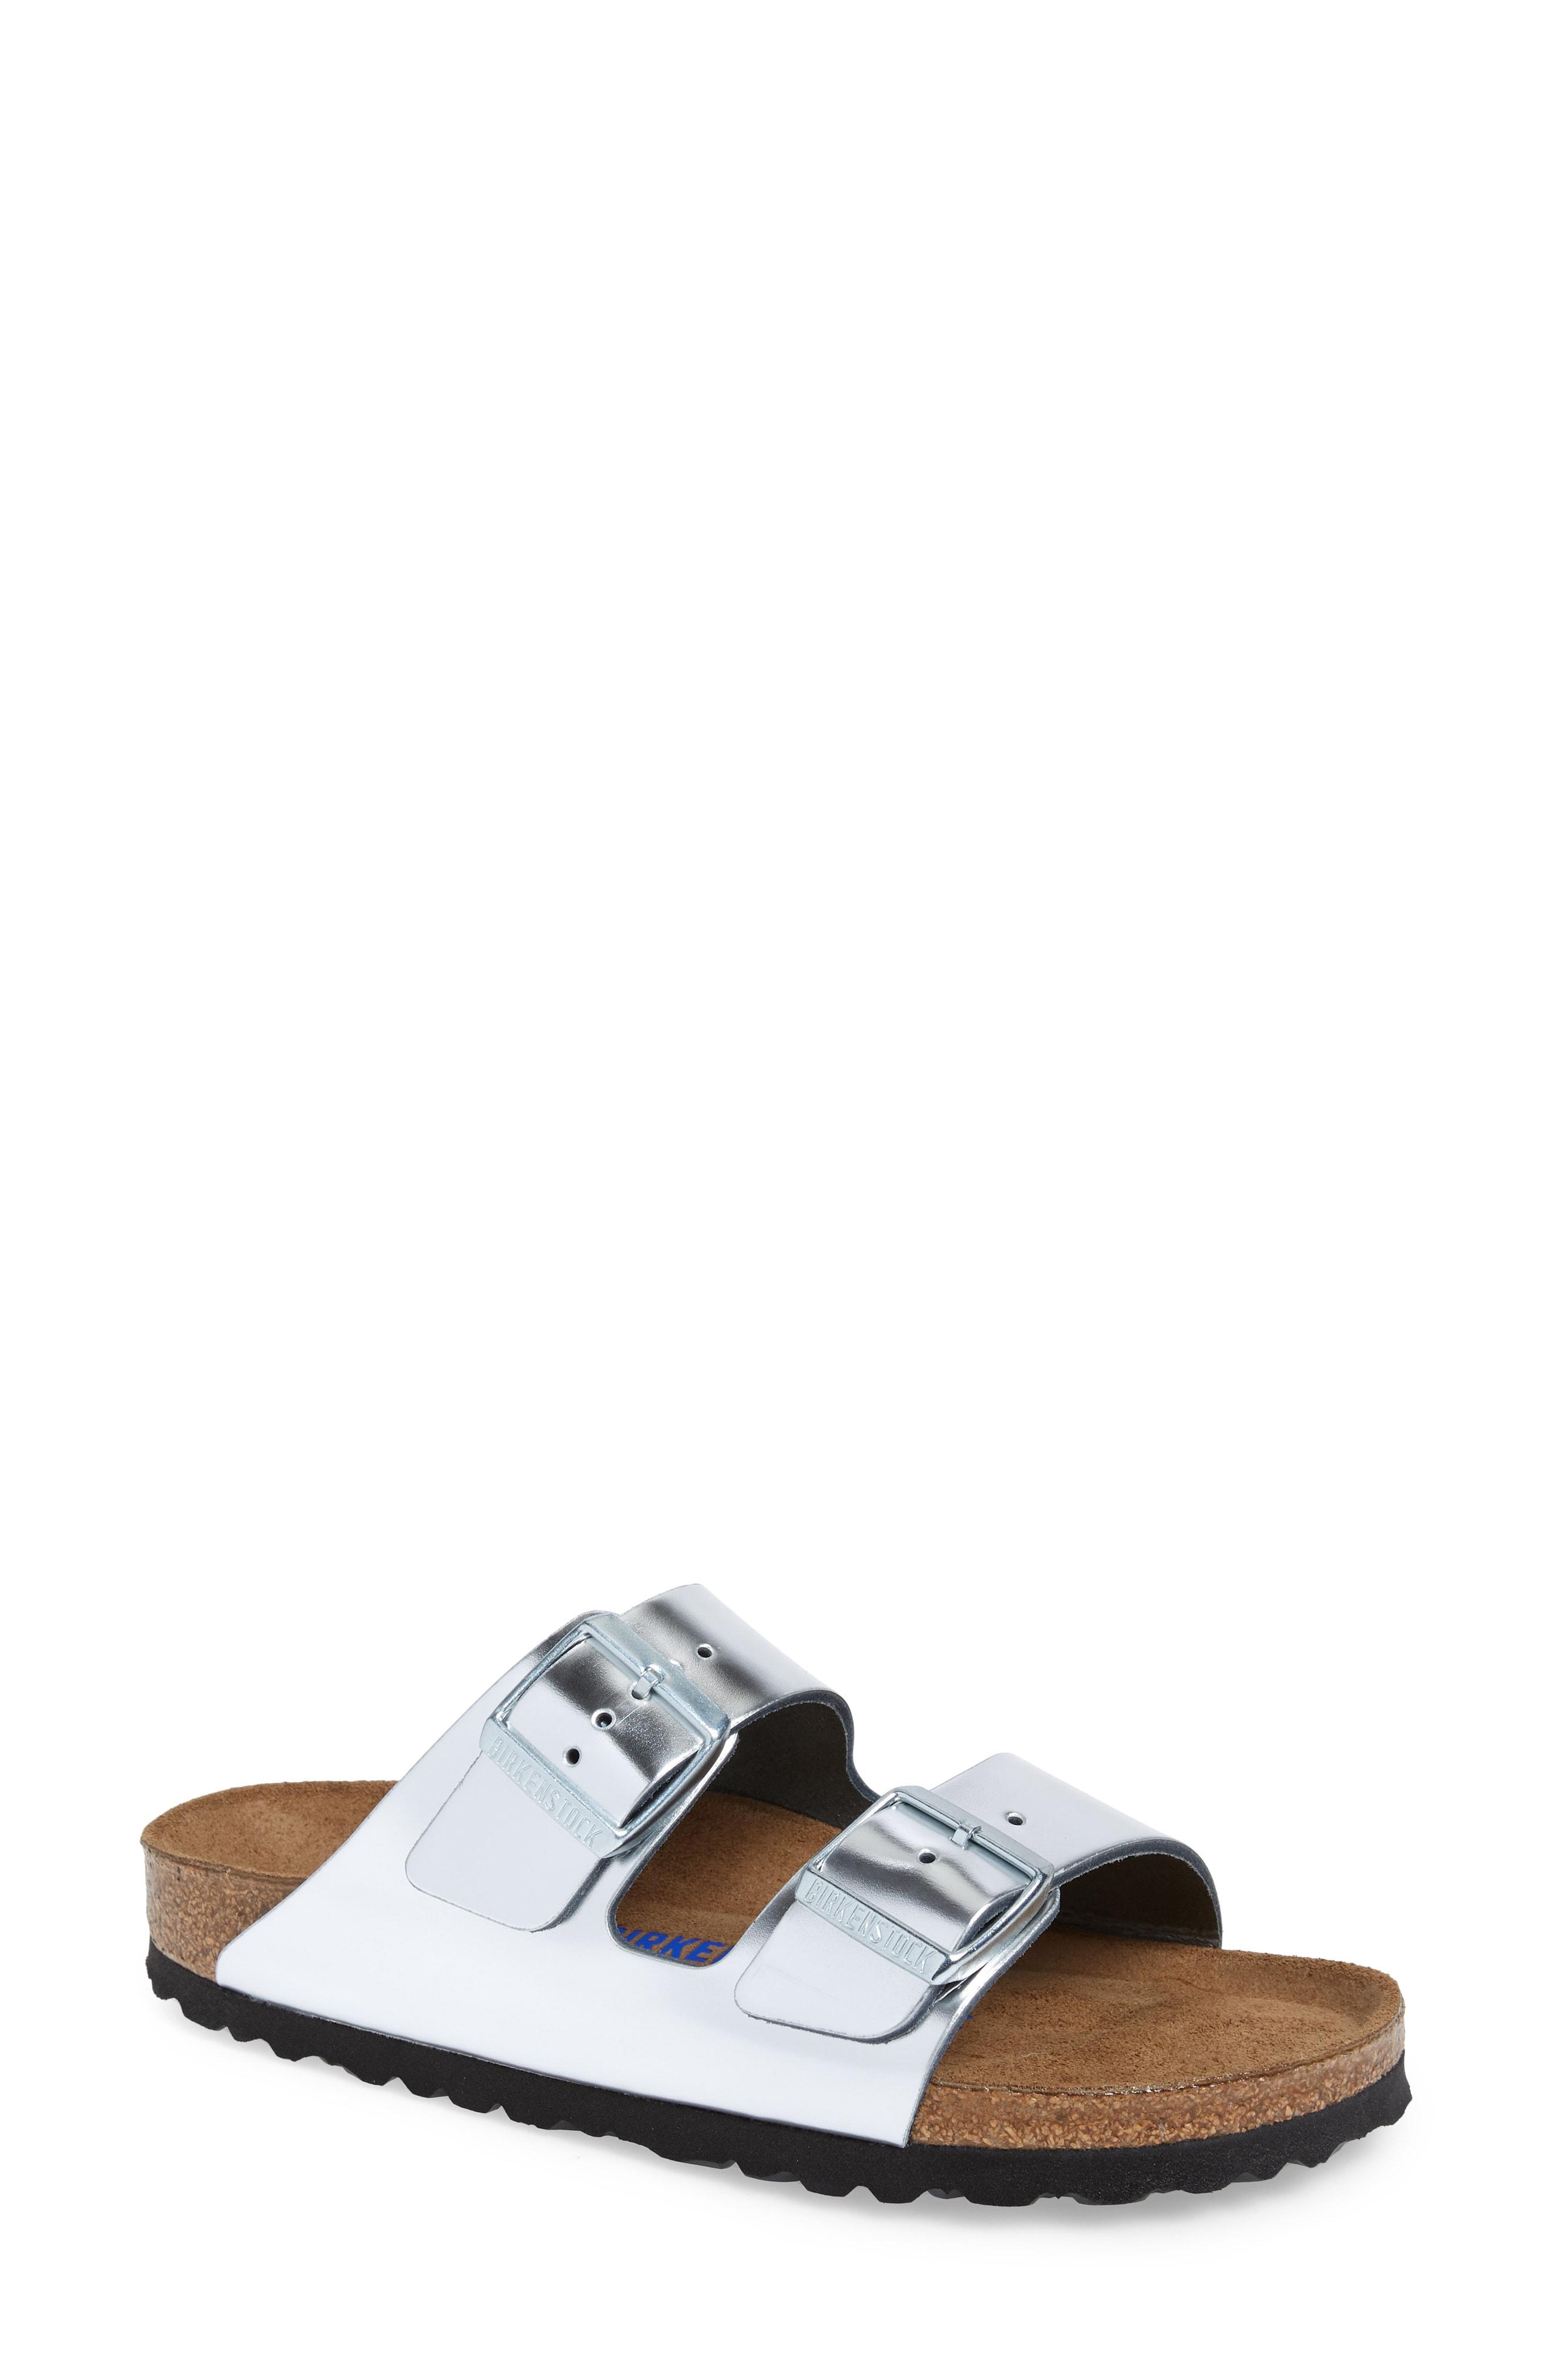 Birkenstock Arizona Soft Footbed Slide Sandal (Women)